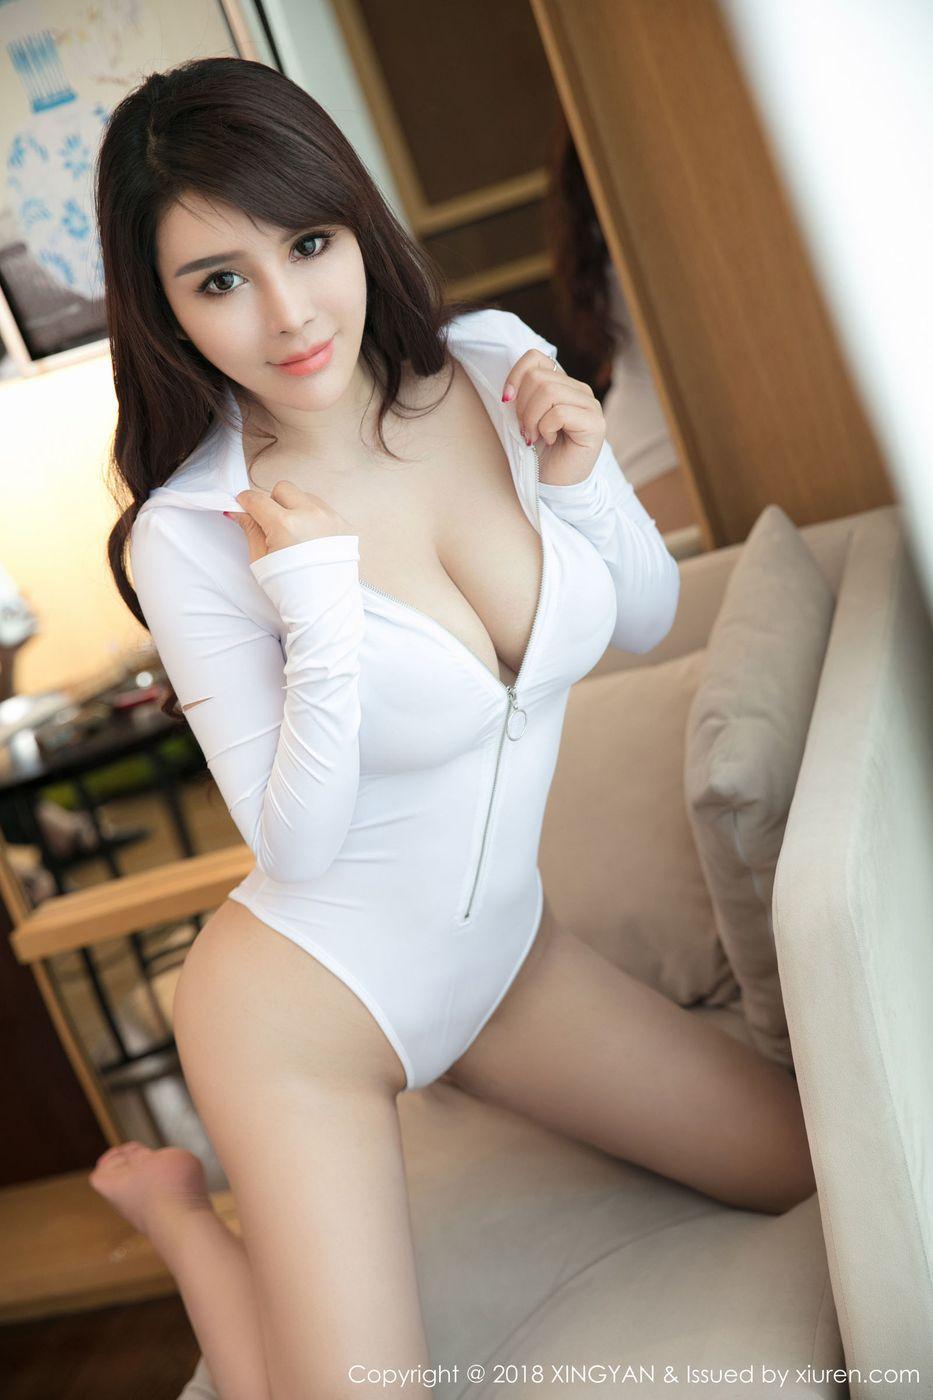 [XINGYAN星颜社] 美女模特雪千寻千娇百媚蕾丝内衣魅惑私房写真 Vol.047